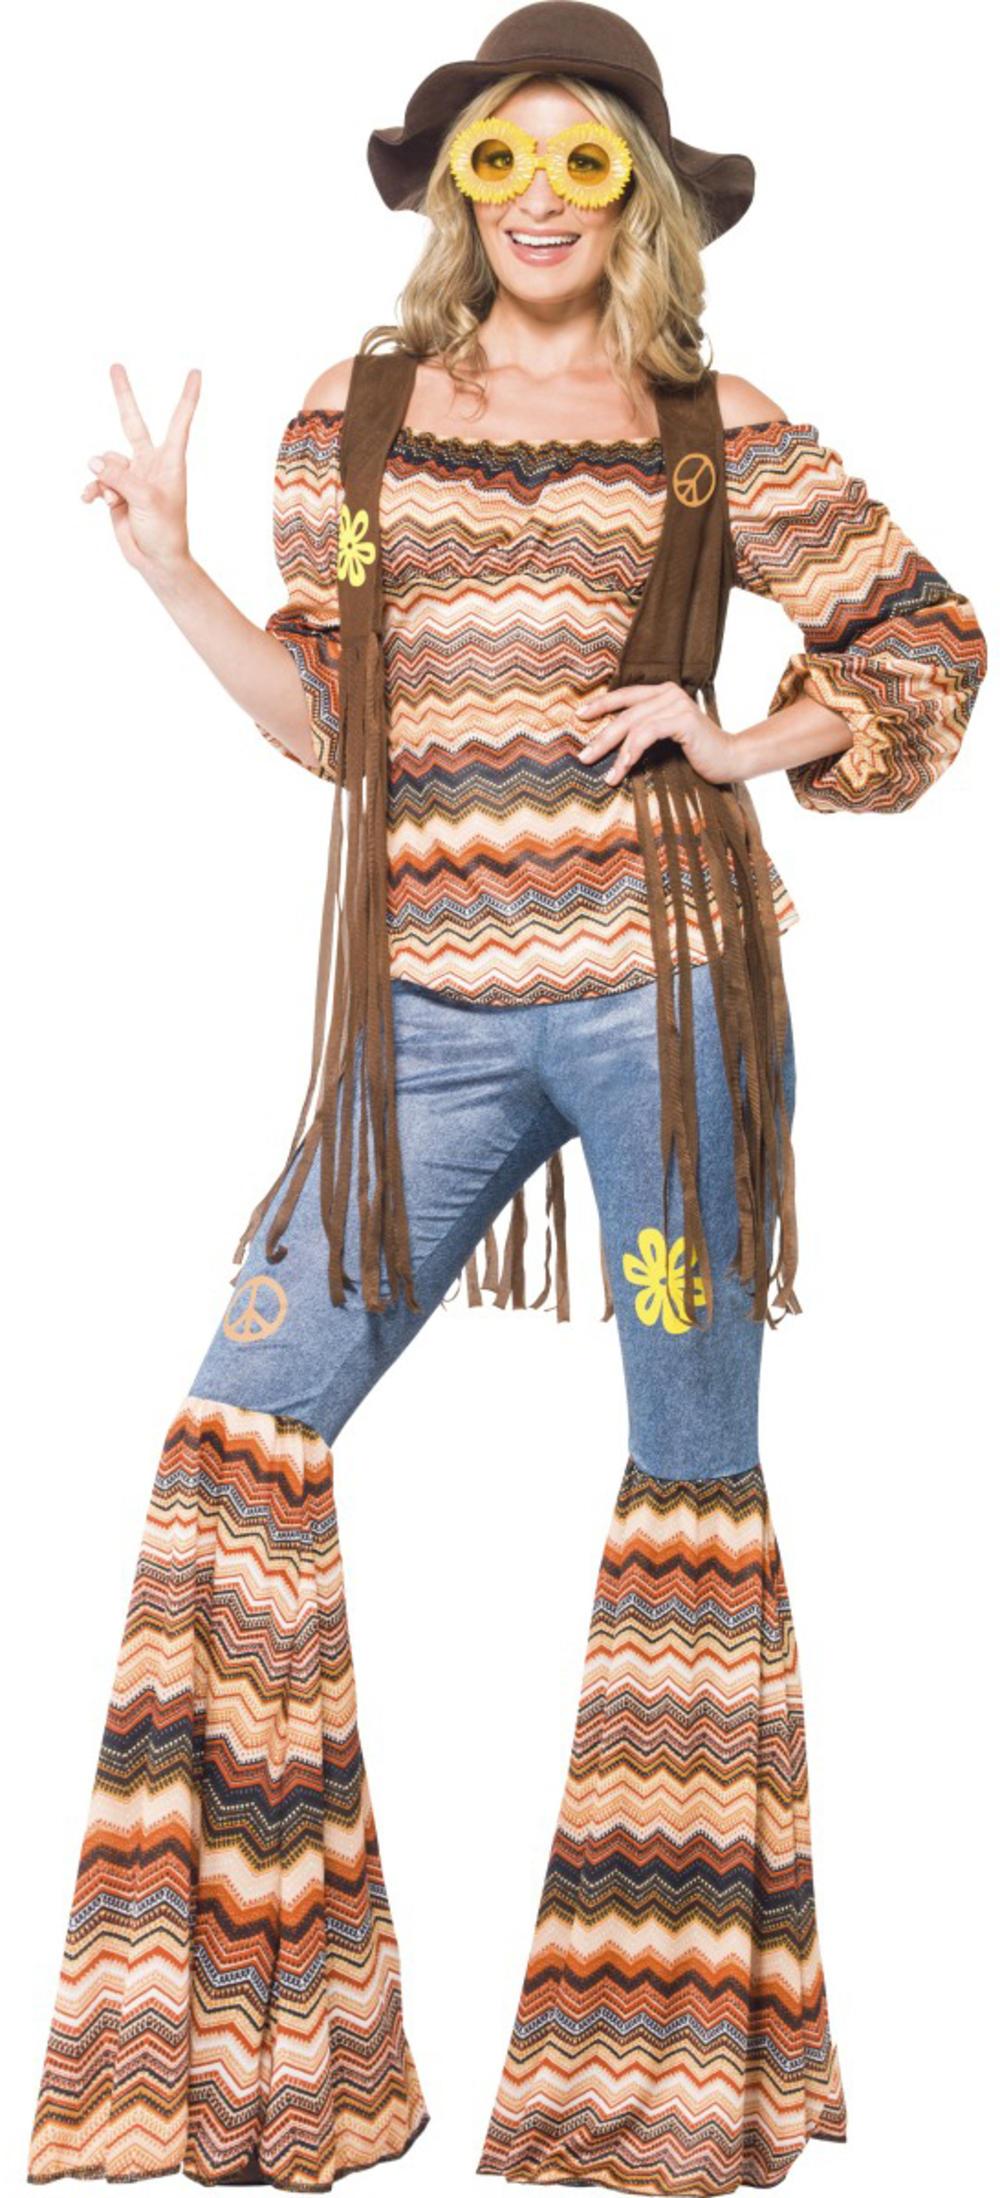 Harmony Hippie Ladies Fancy Dress 1960s 1970s Groovy Hippy Womens Adults Costume